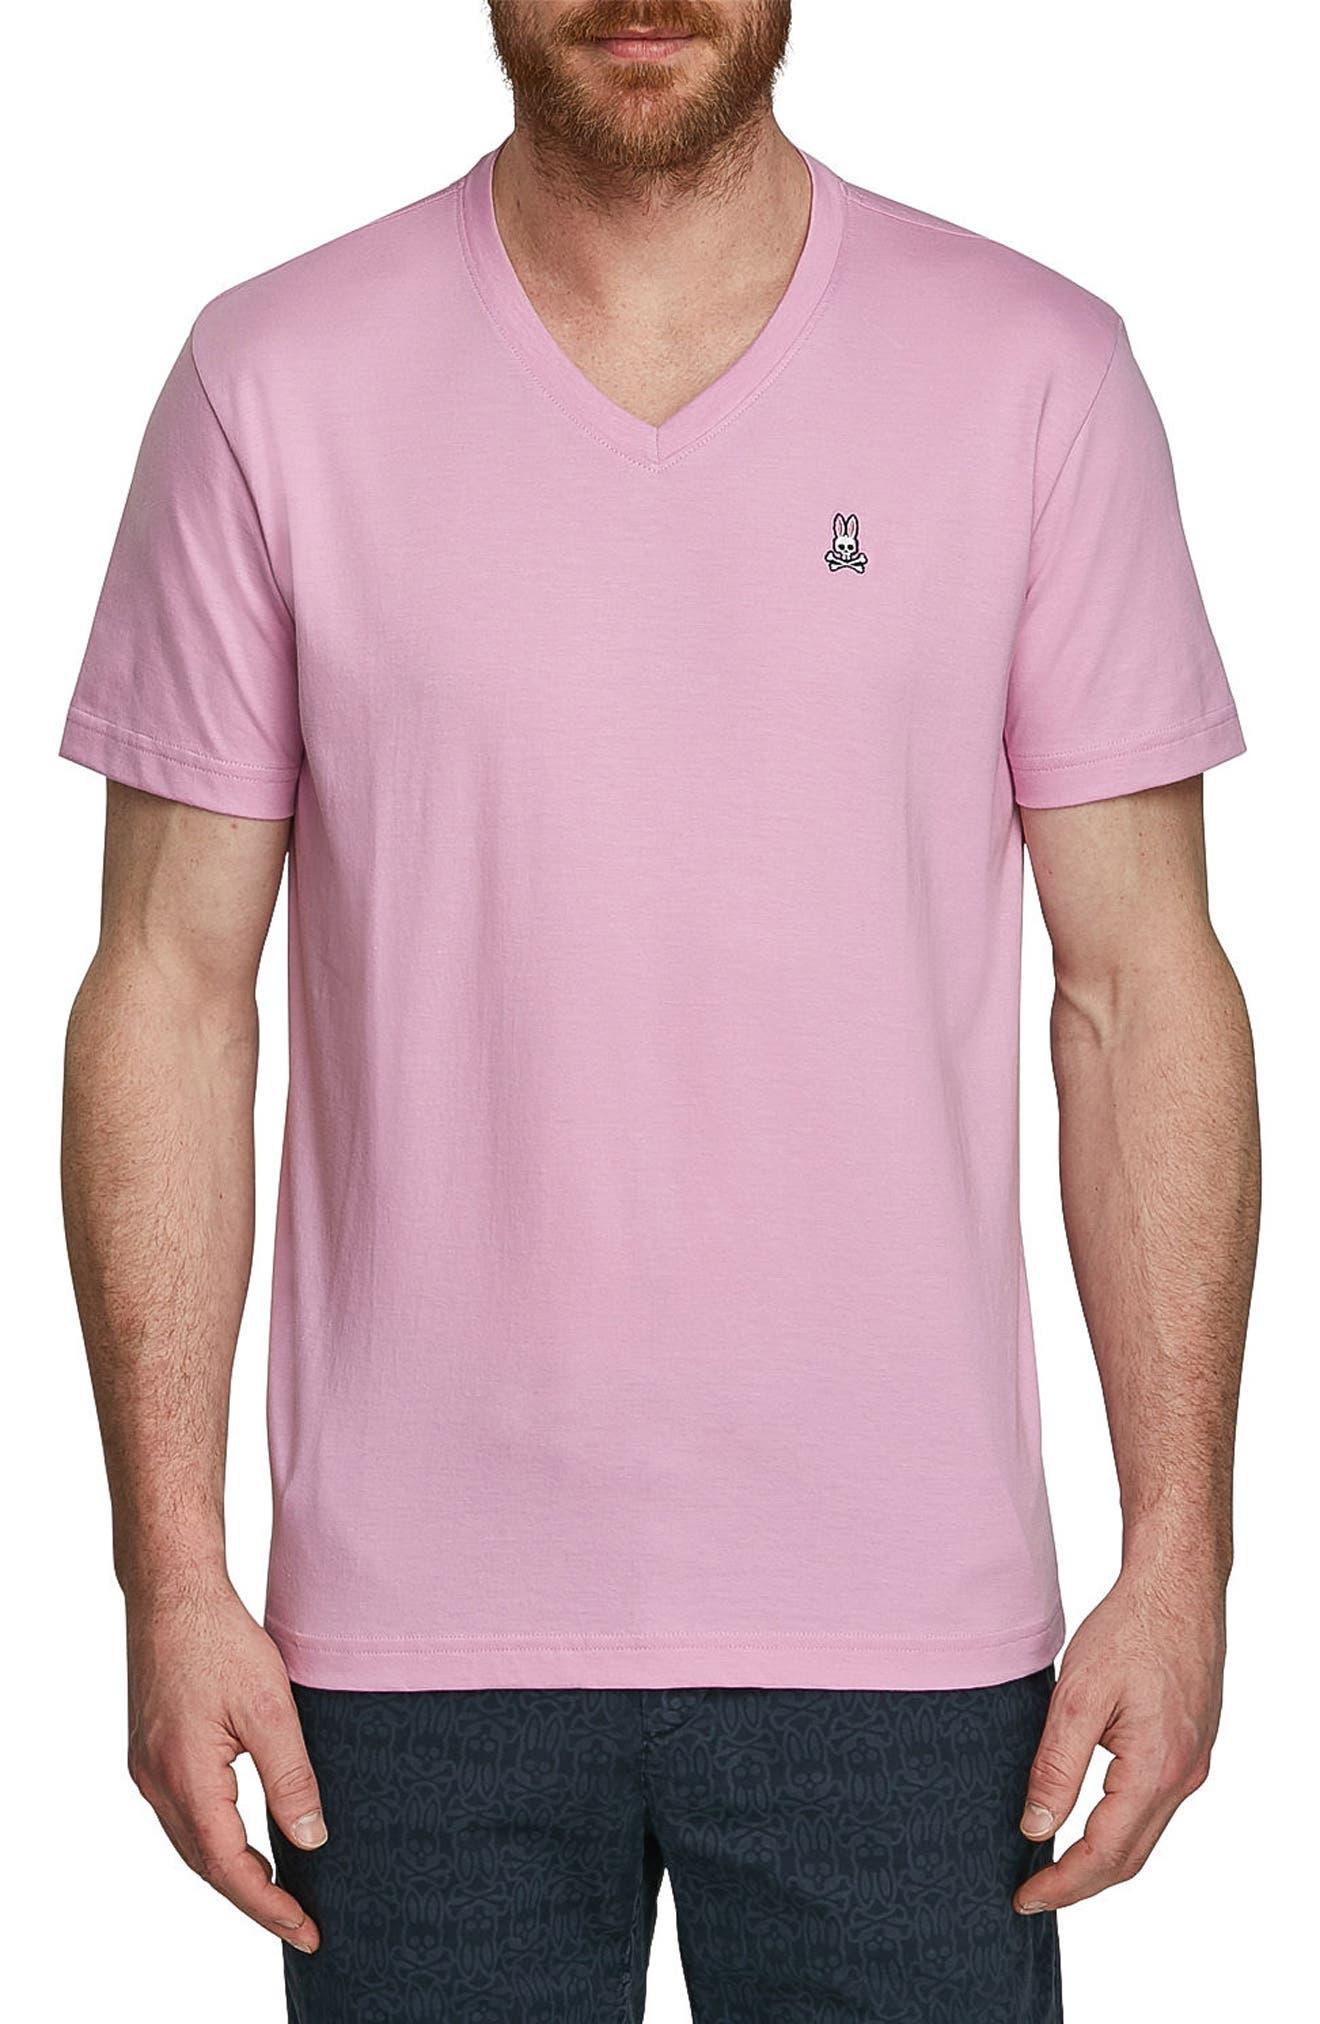 Alternate Image 1 Selected - Psycho Bunny V-Neck T-Shirt